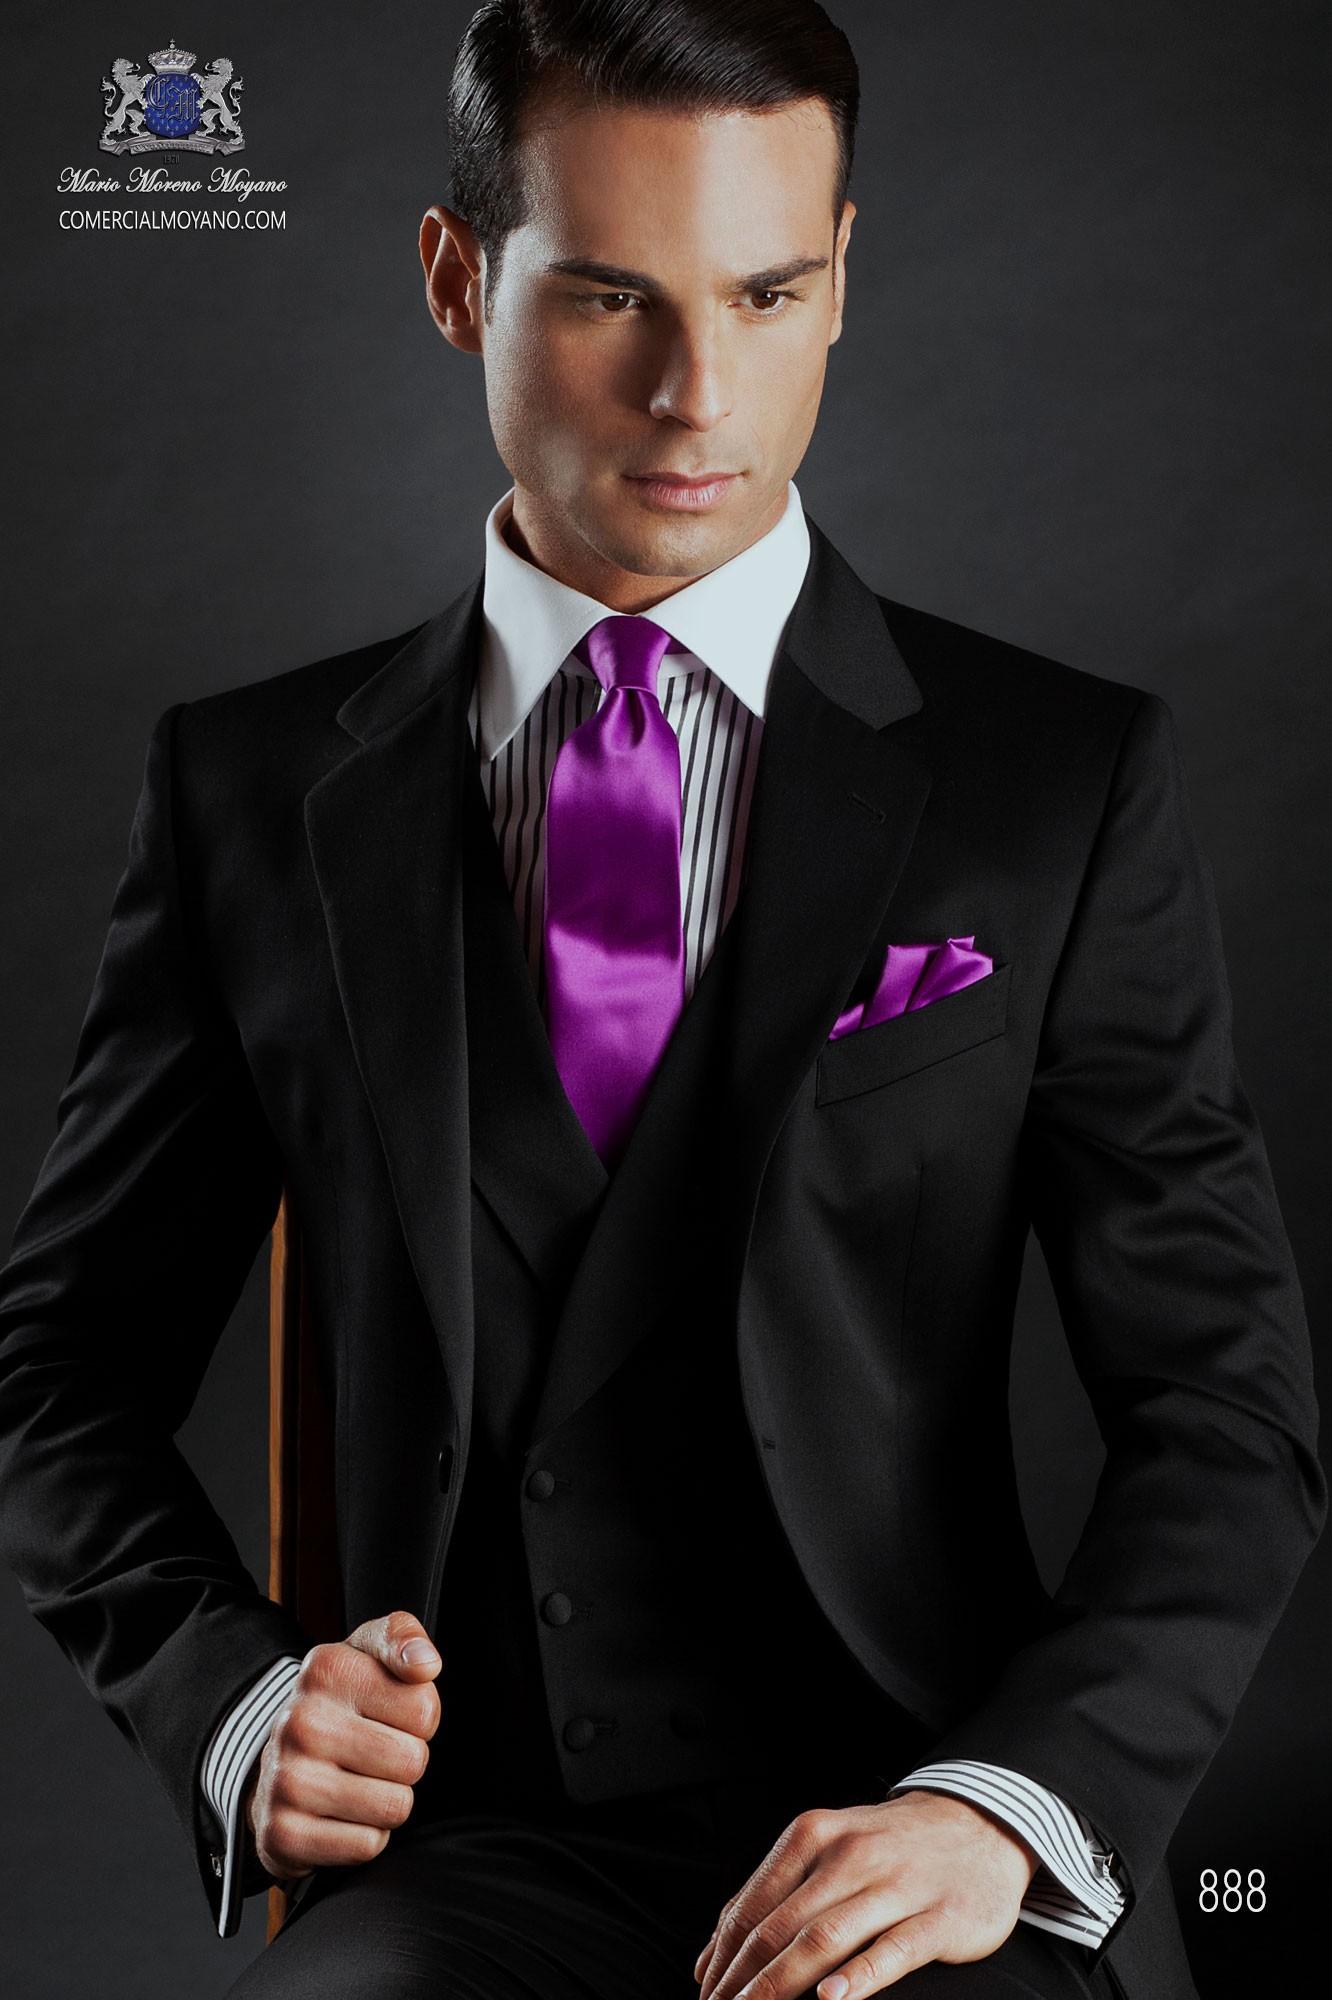 Gentleman black men wedding suit model 888 Ottavio Nuccio Gala